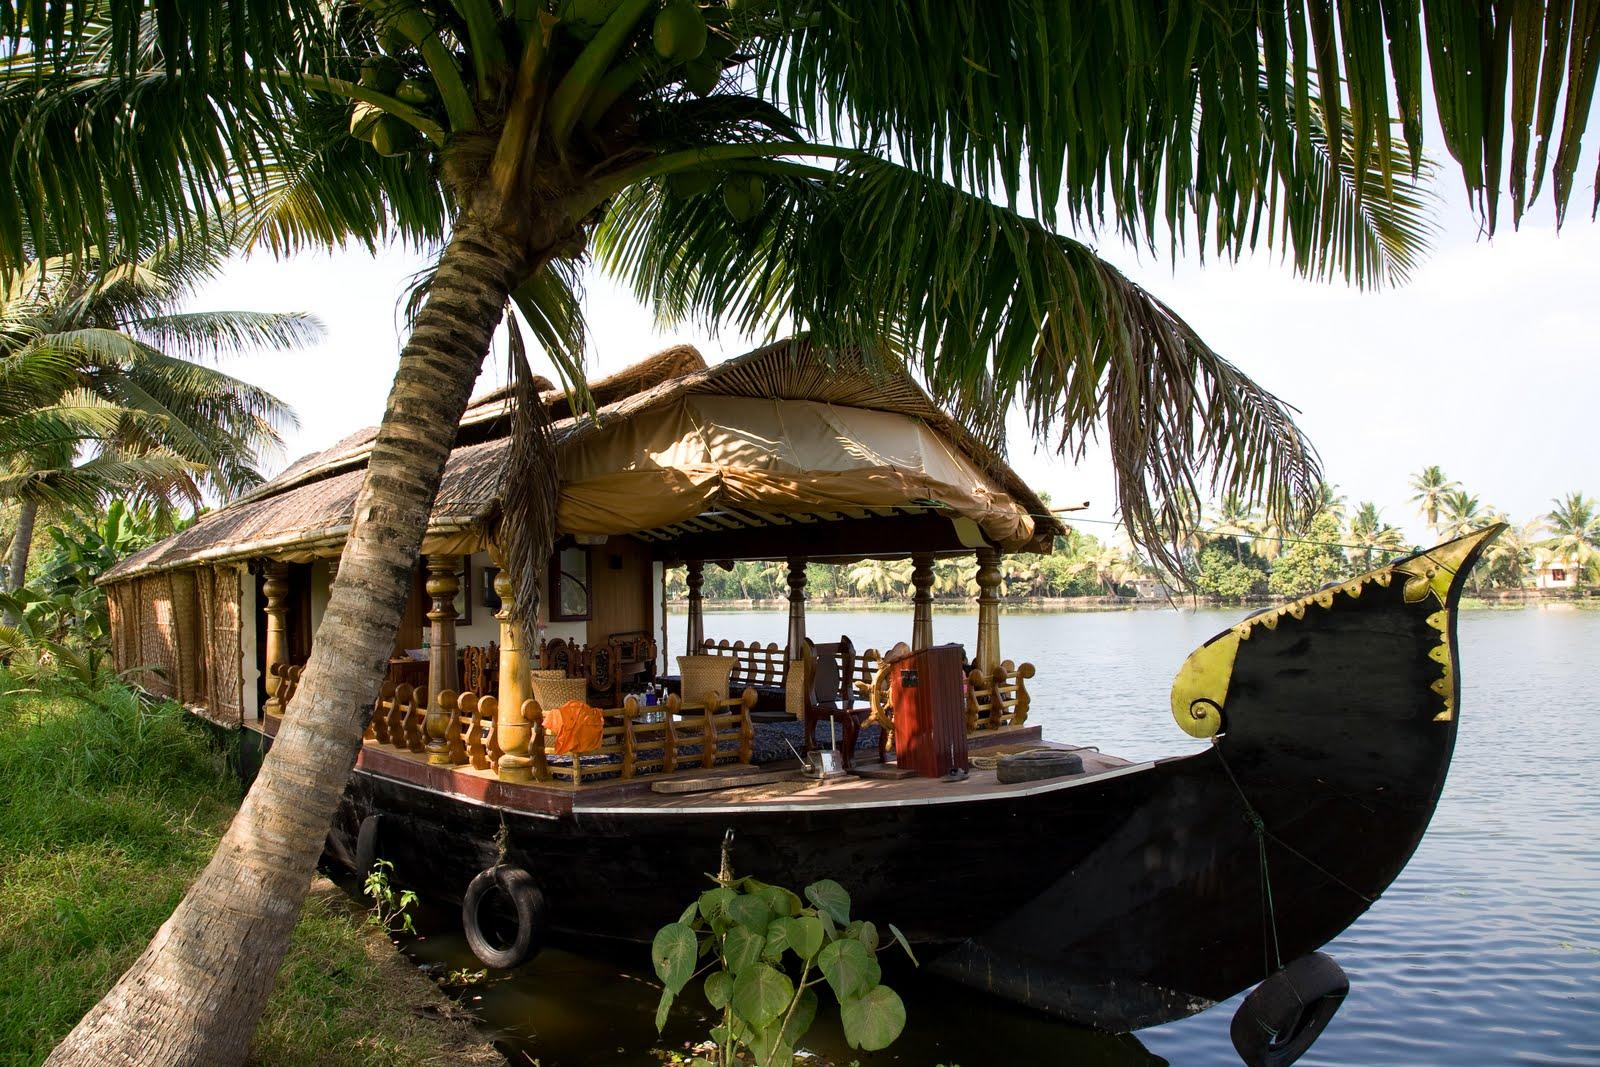 House+Boat+&+Backwaters+3.0.jpg